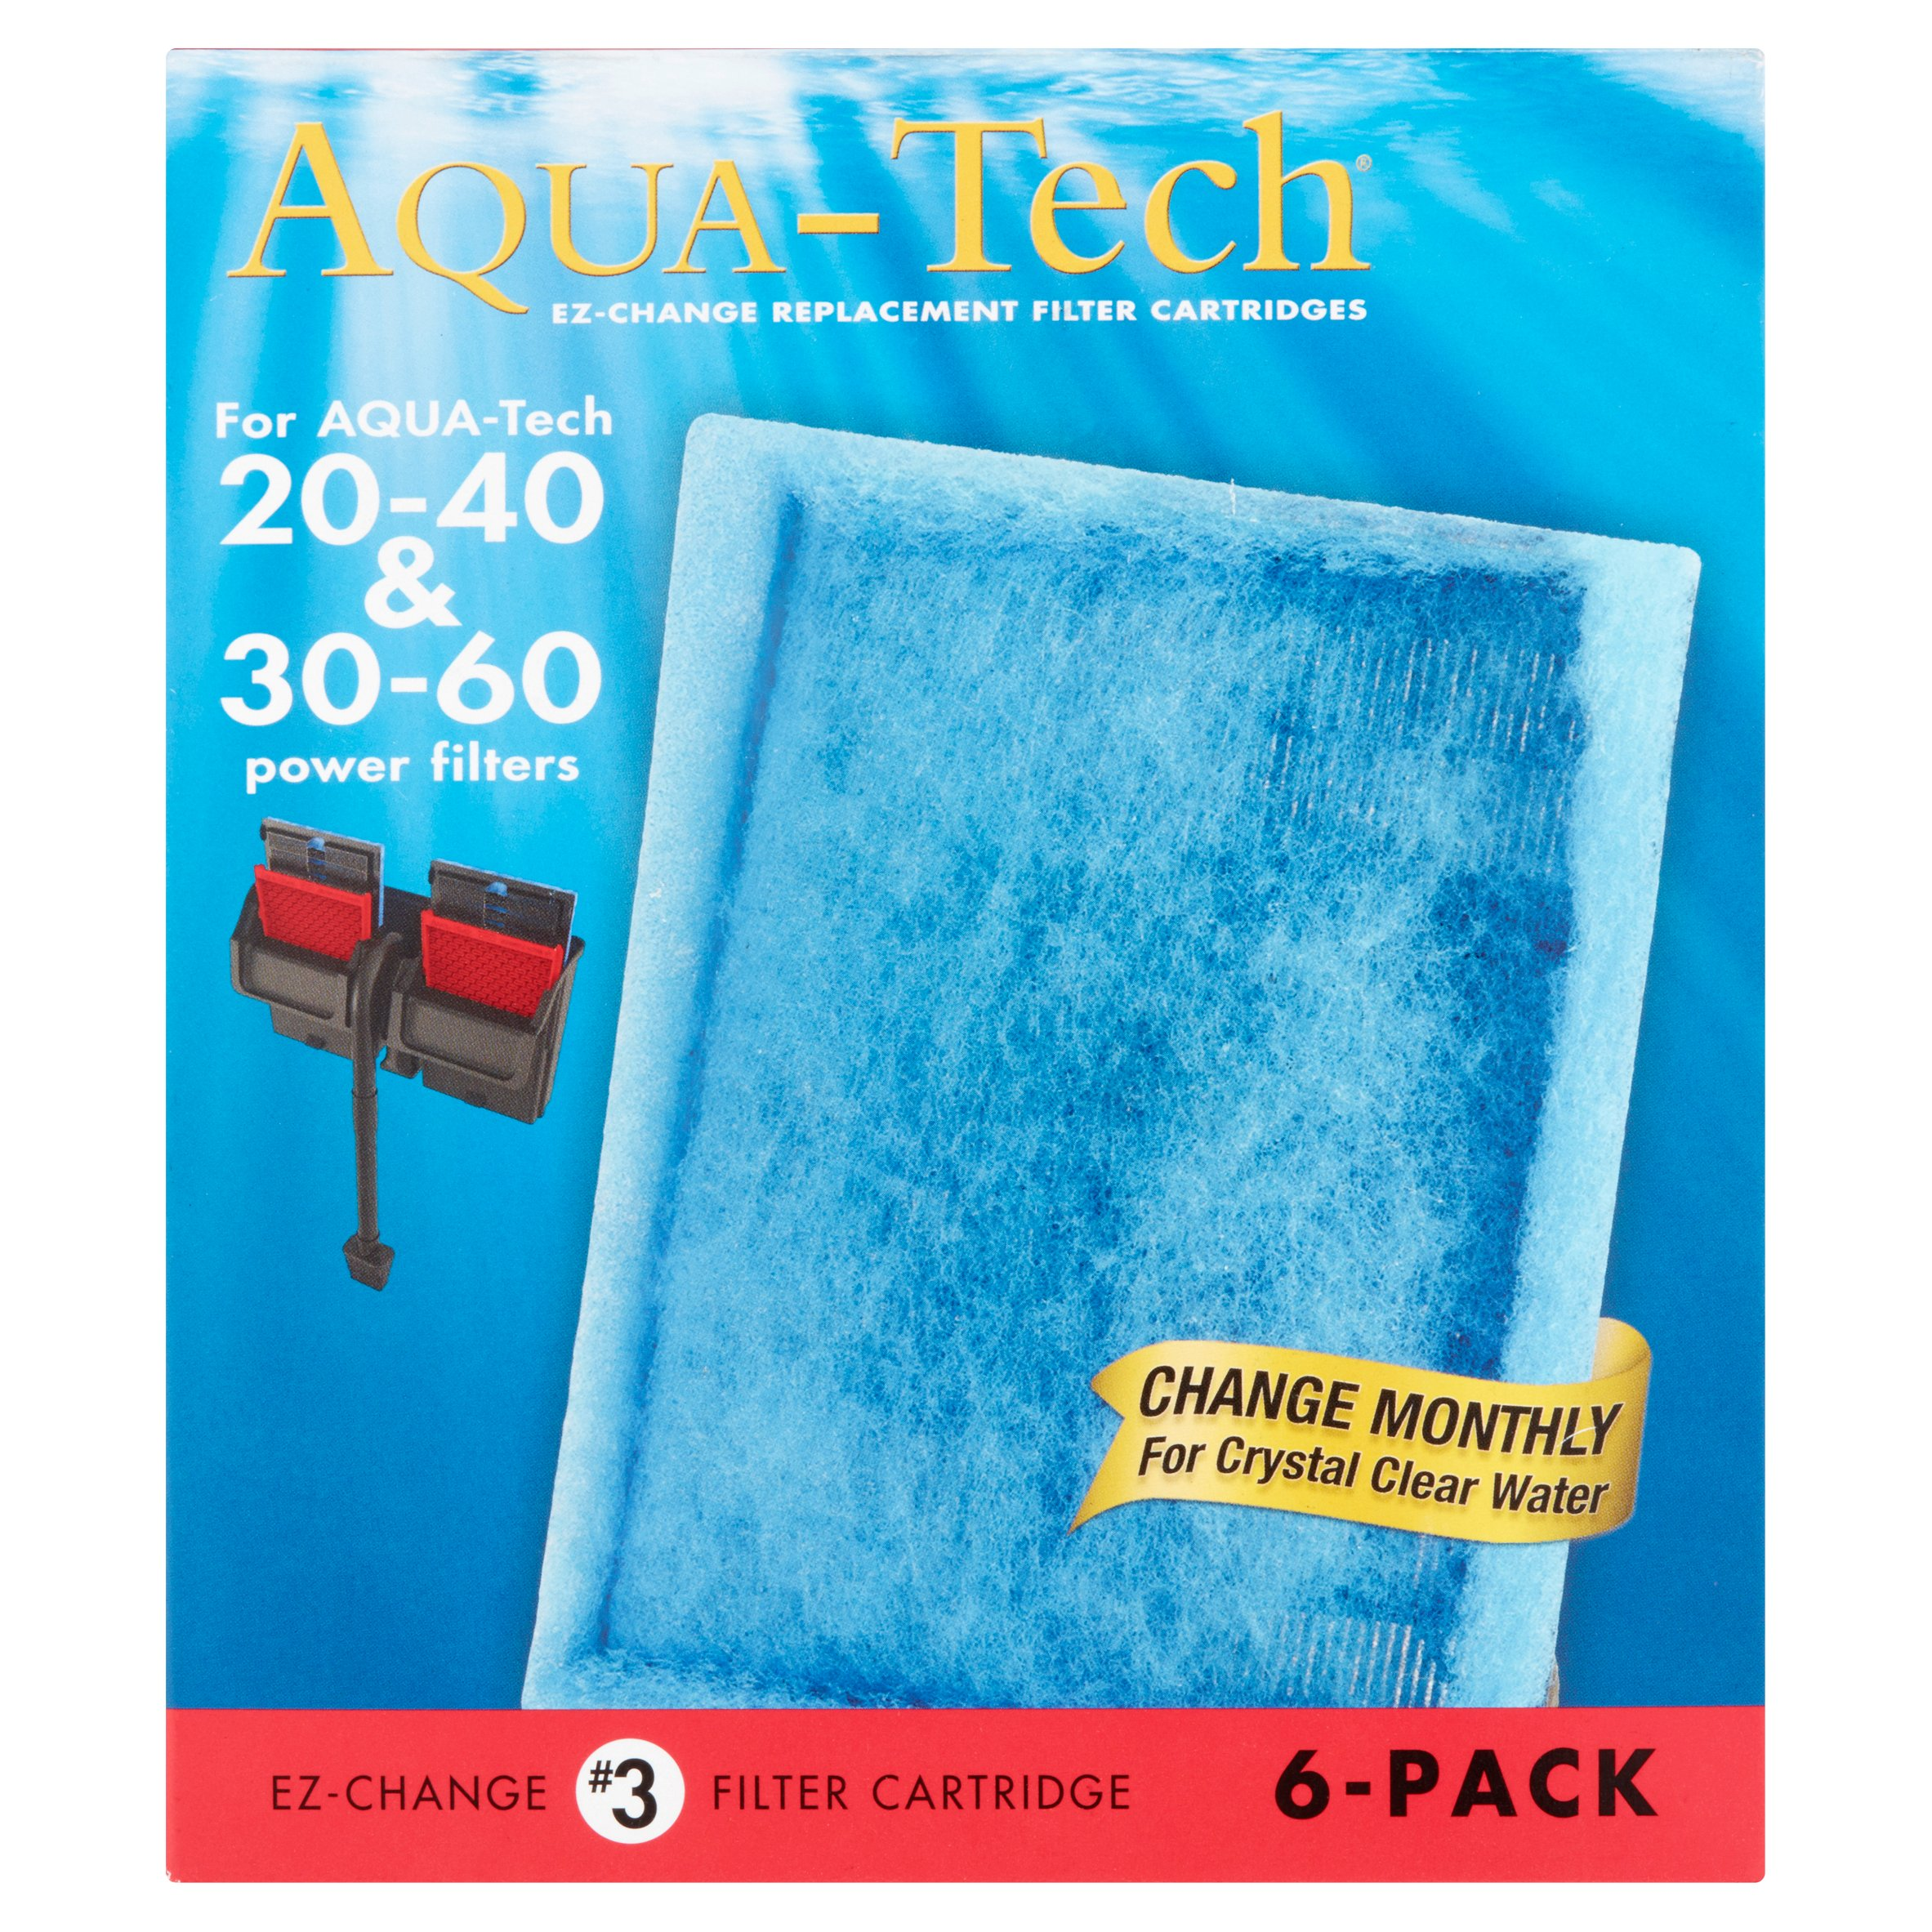 Aqua-Tech EZ-Change #3 Filter Cartridge, 6 pack by United Pet Group